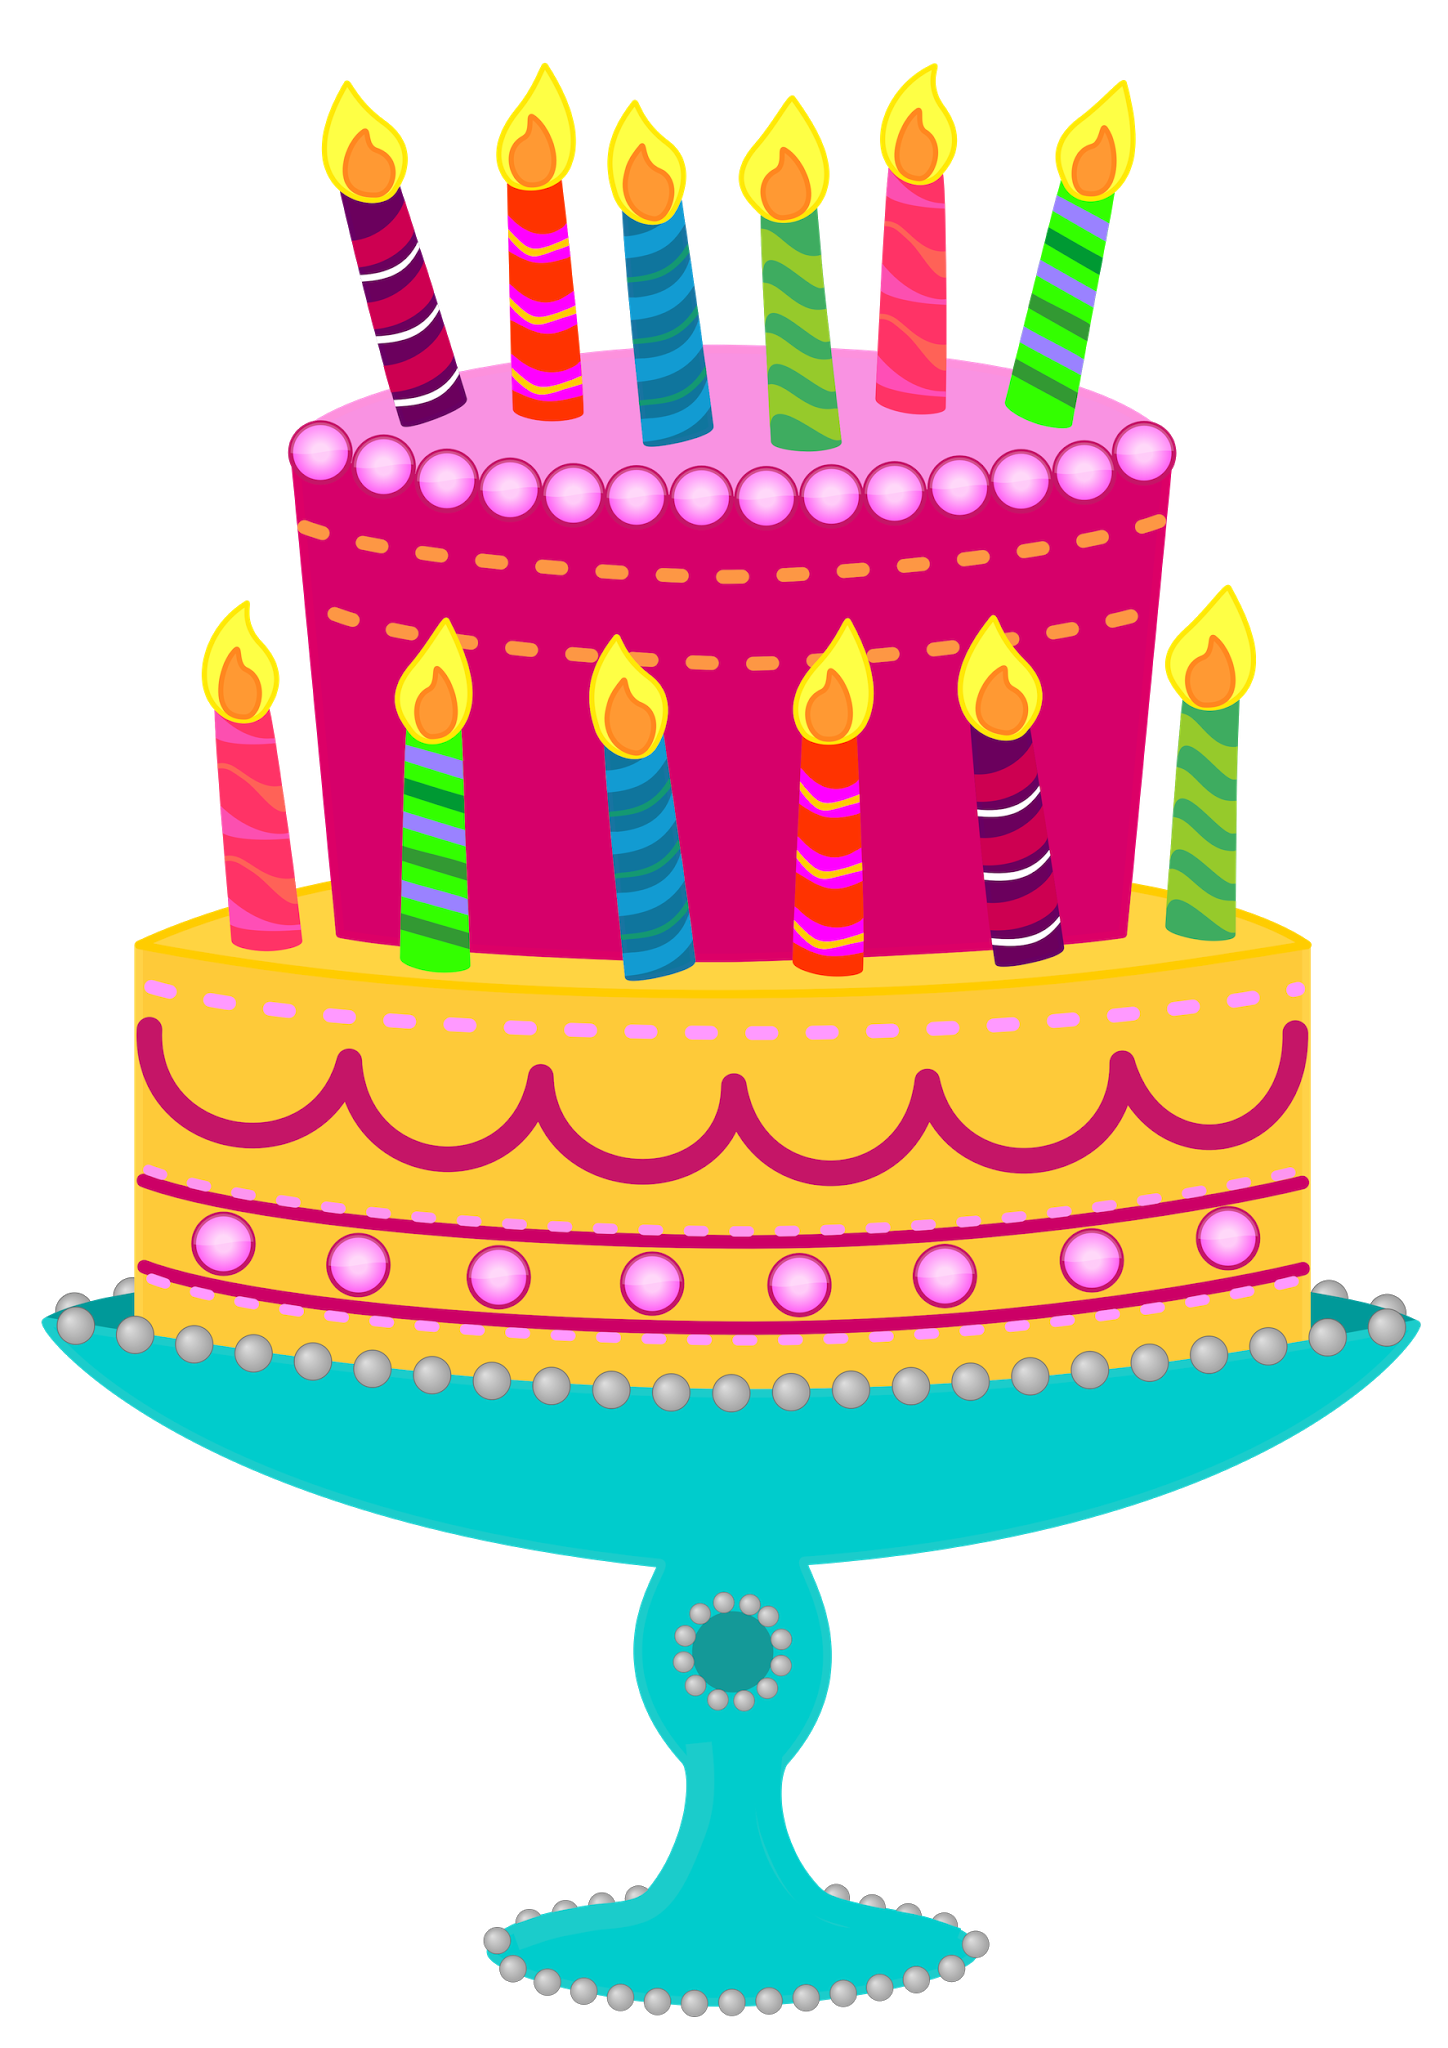 Free Free Birthday Cake Images, Download Free Clip Art, Free.